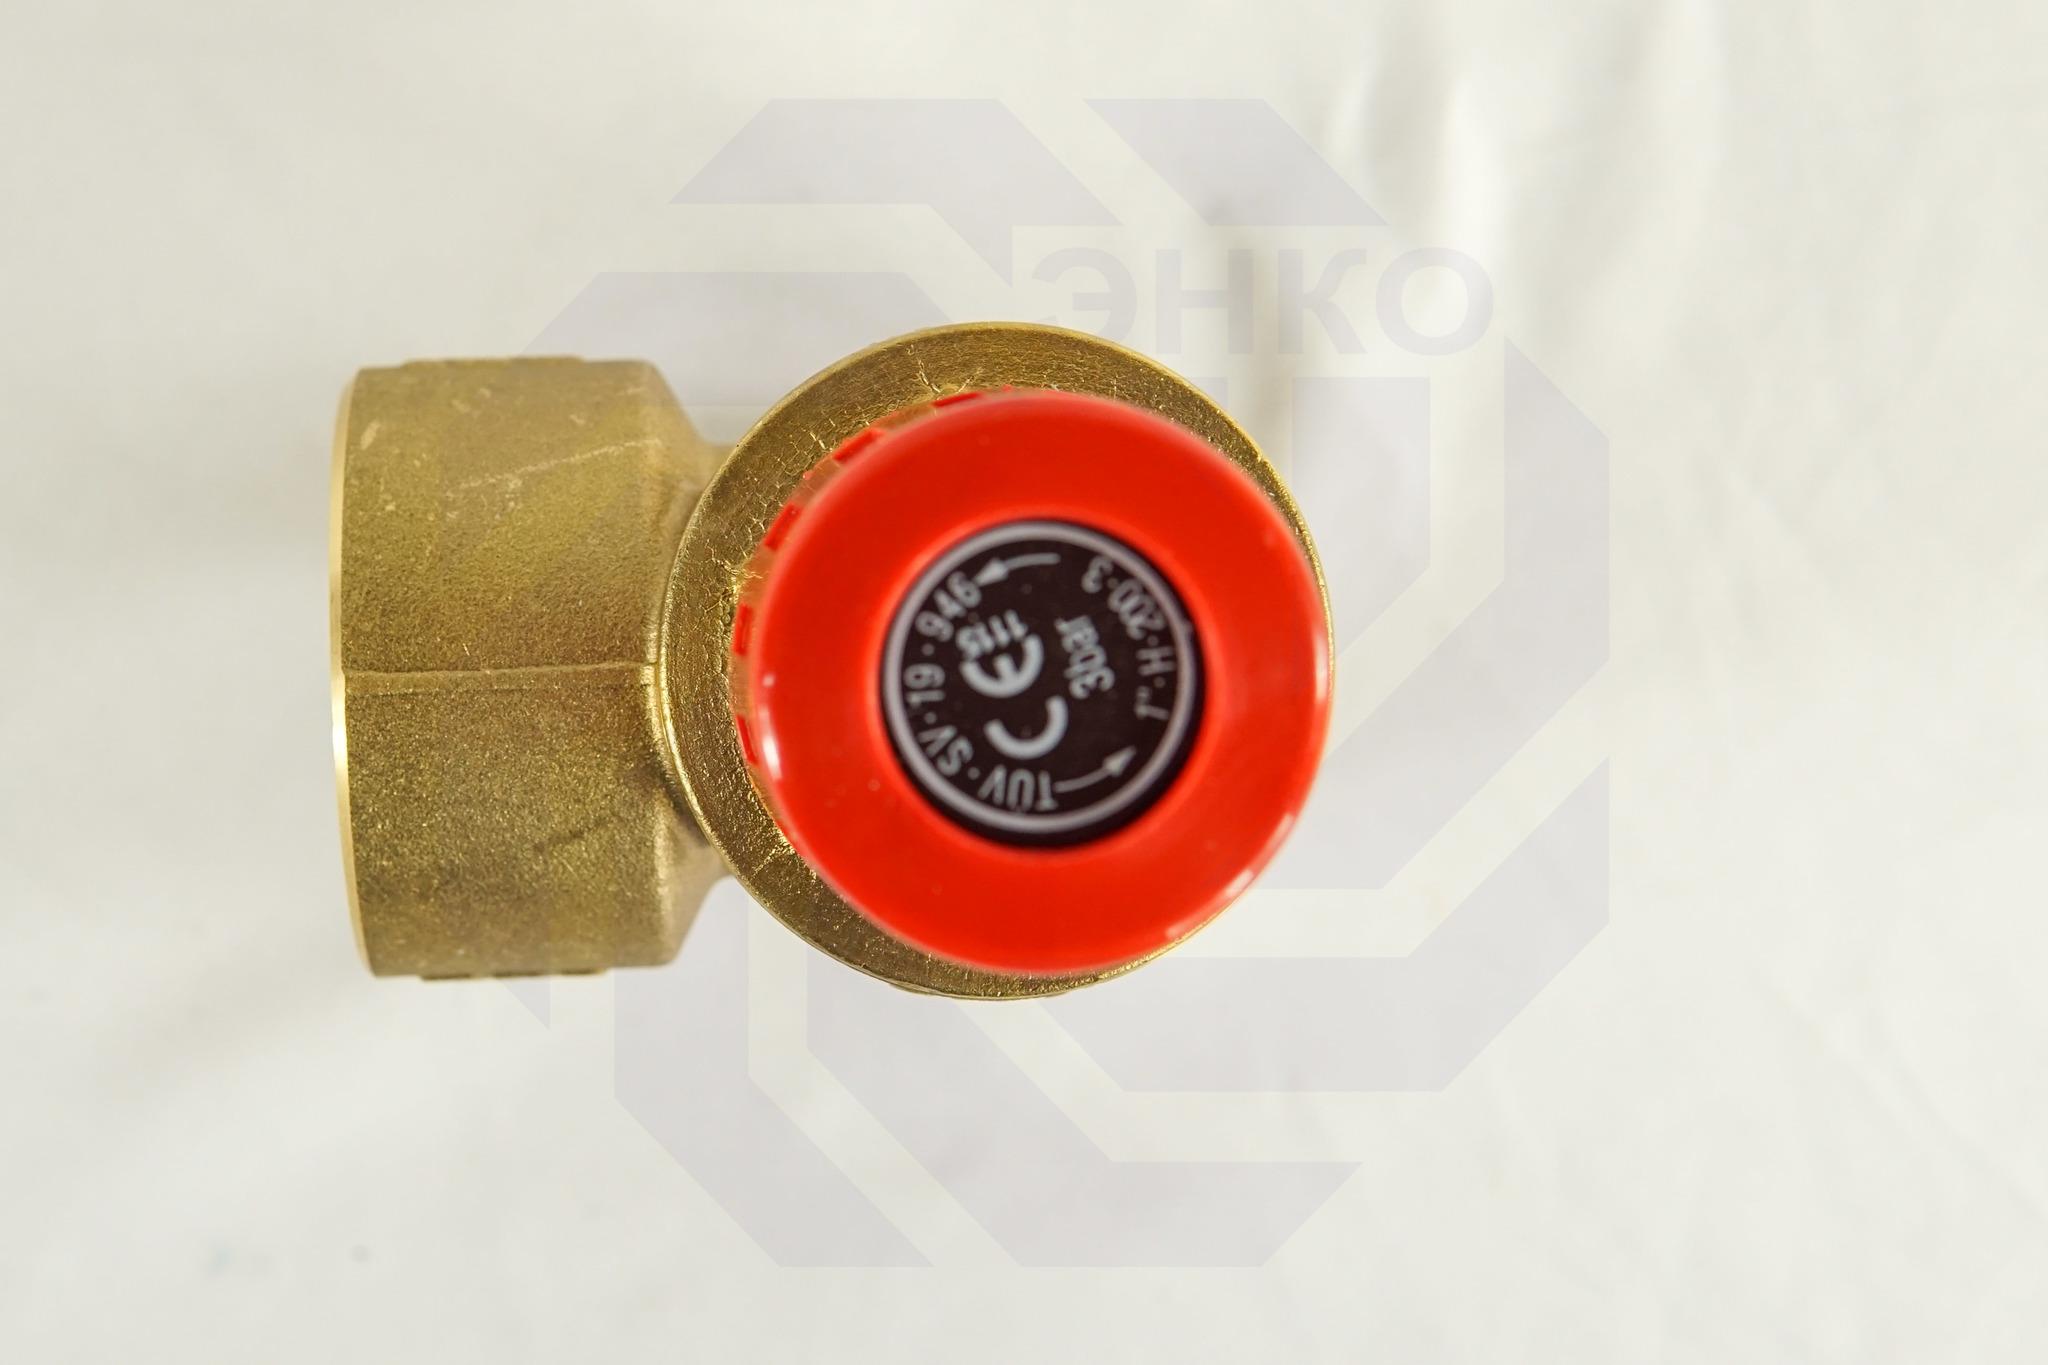 Клапан предохранительный WATTS SVH 3 бар 1